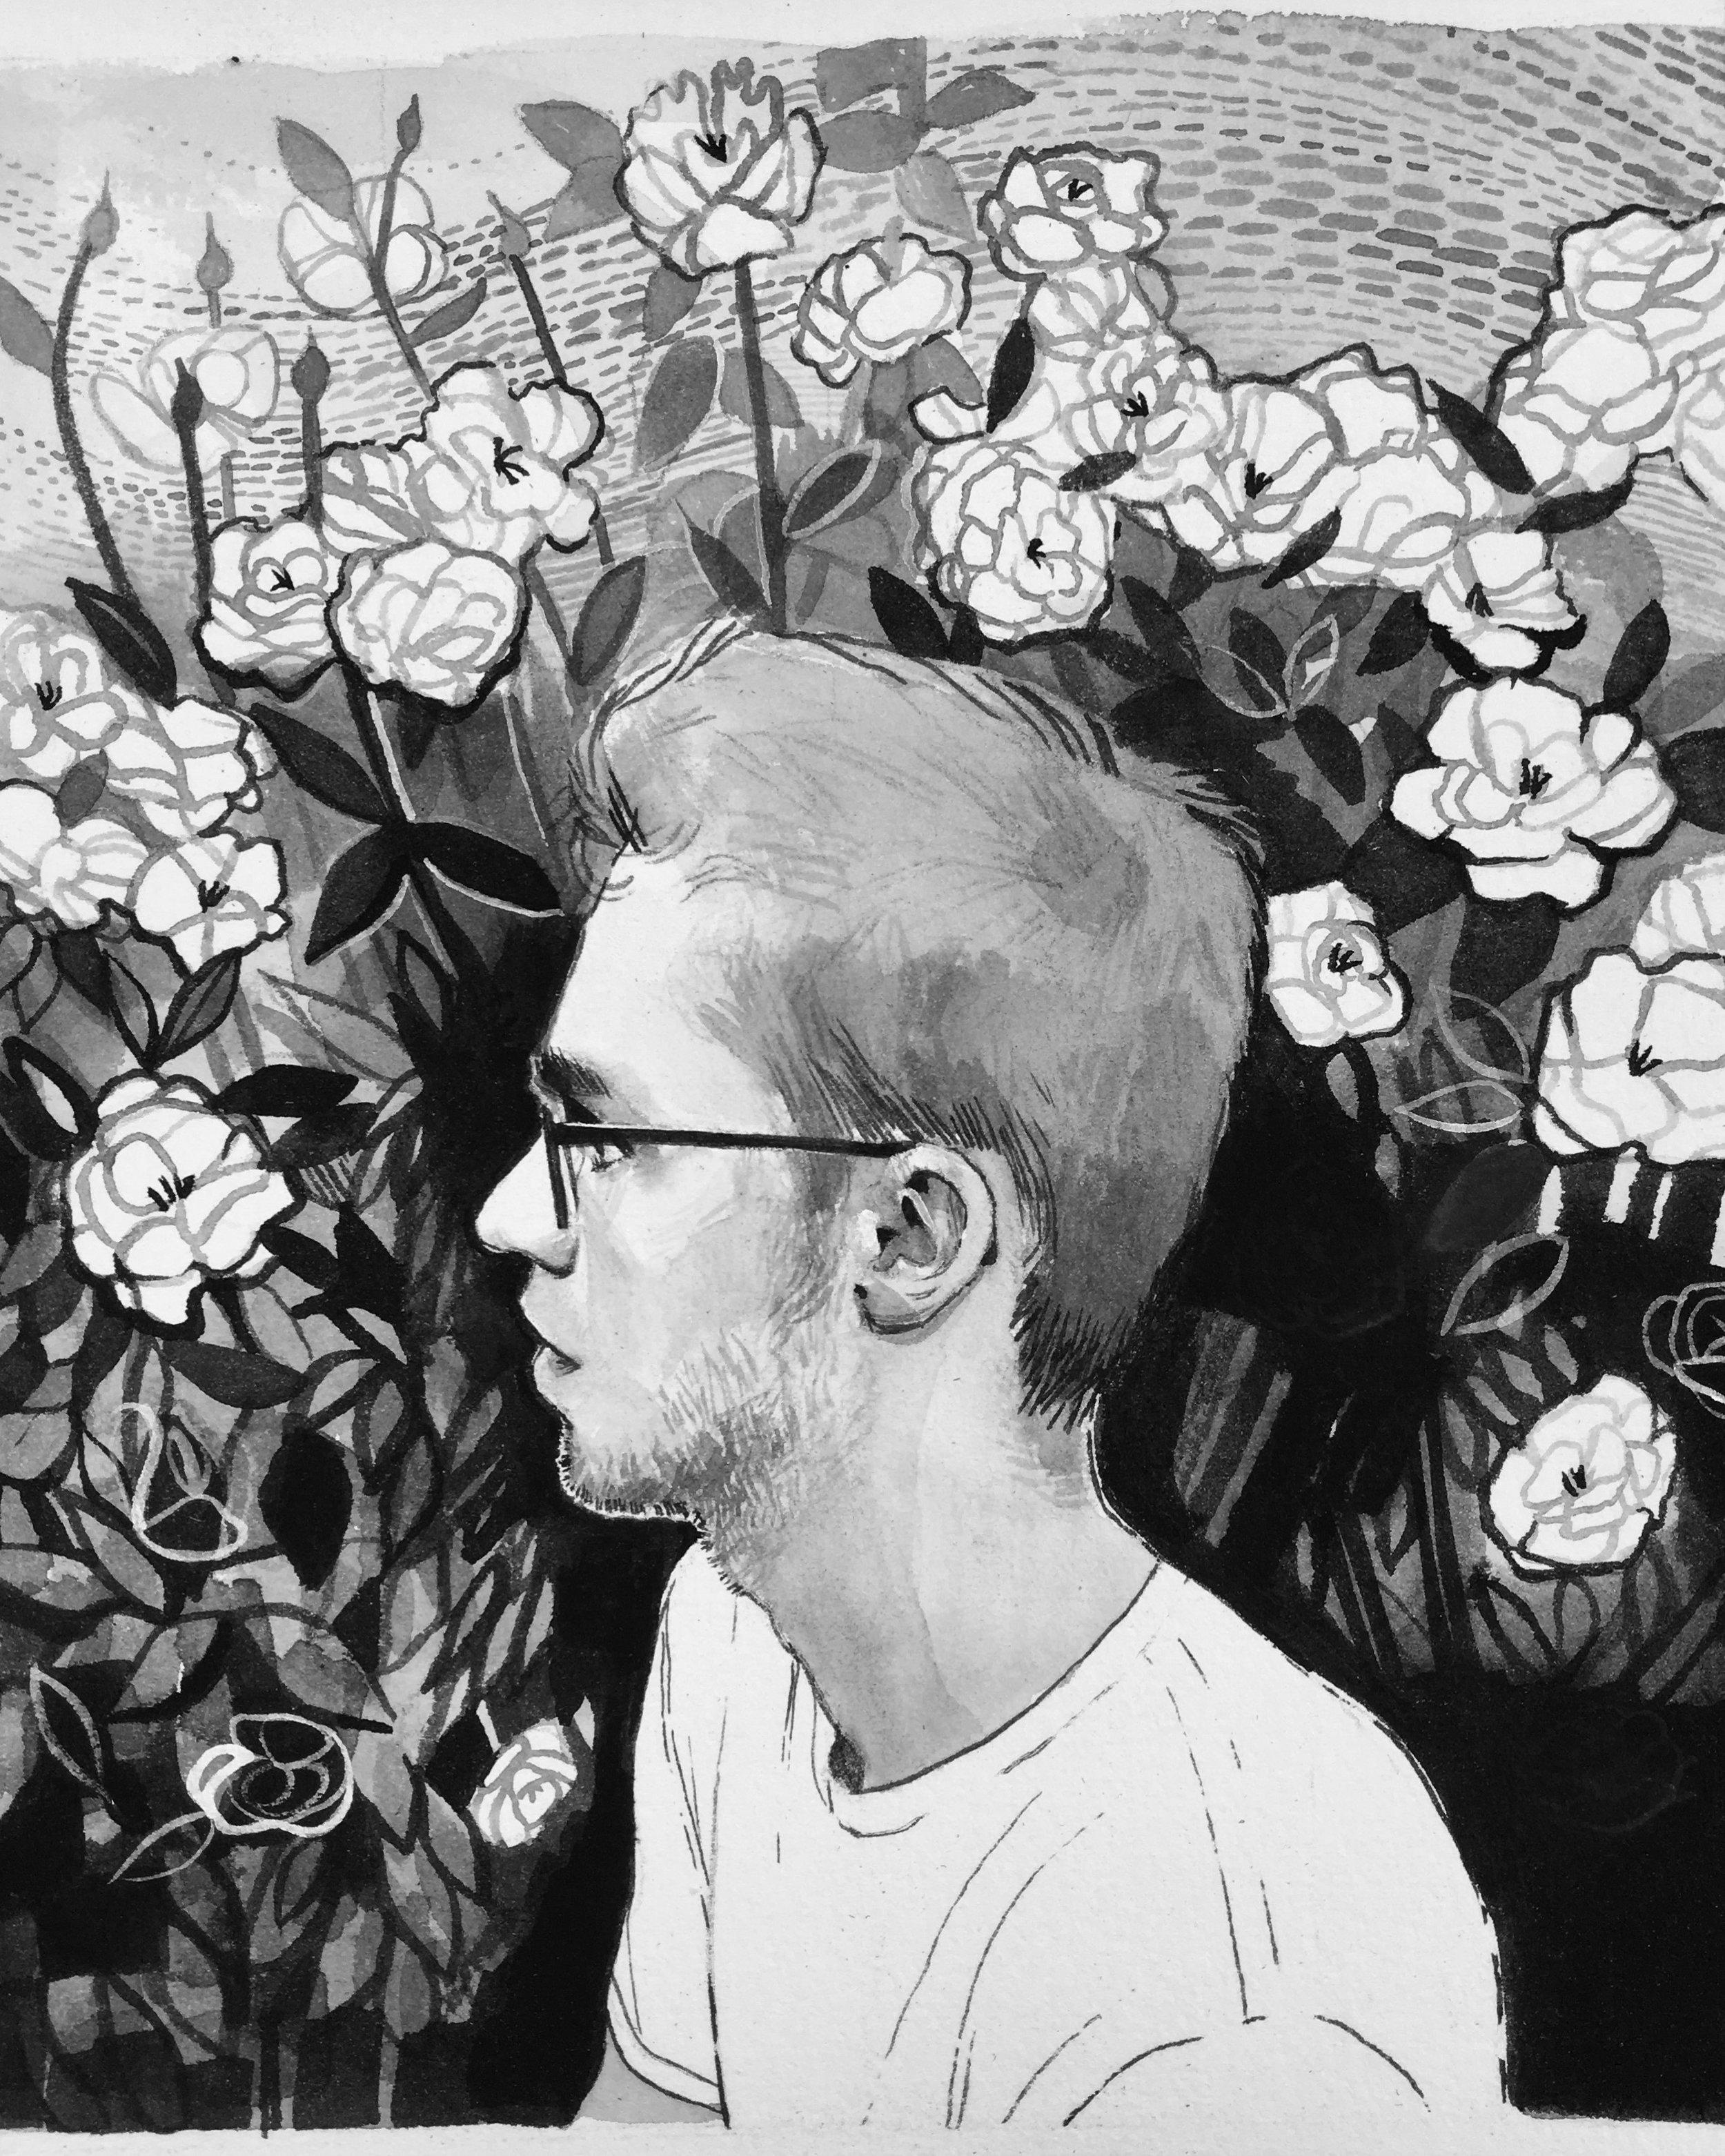 Tristan - (Ink of Paper, 2018)